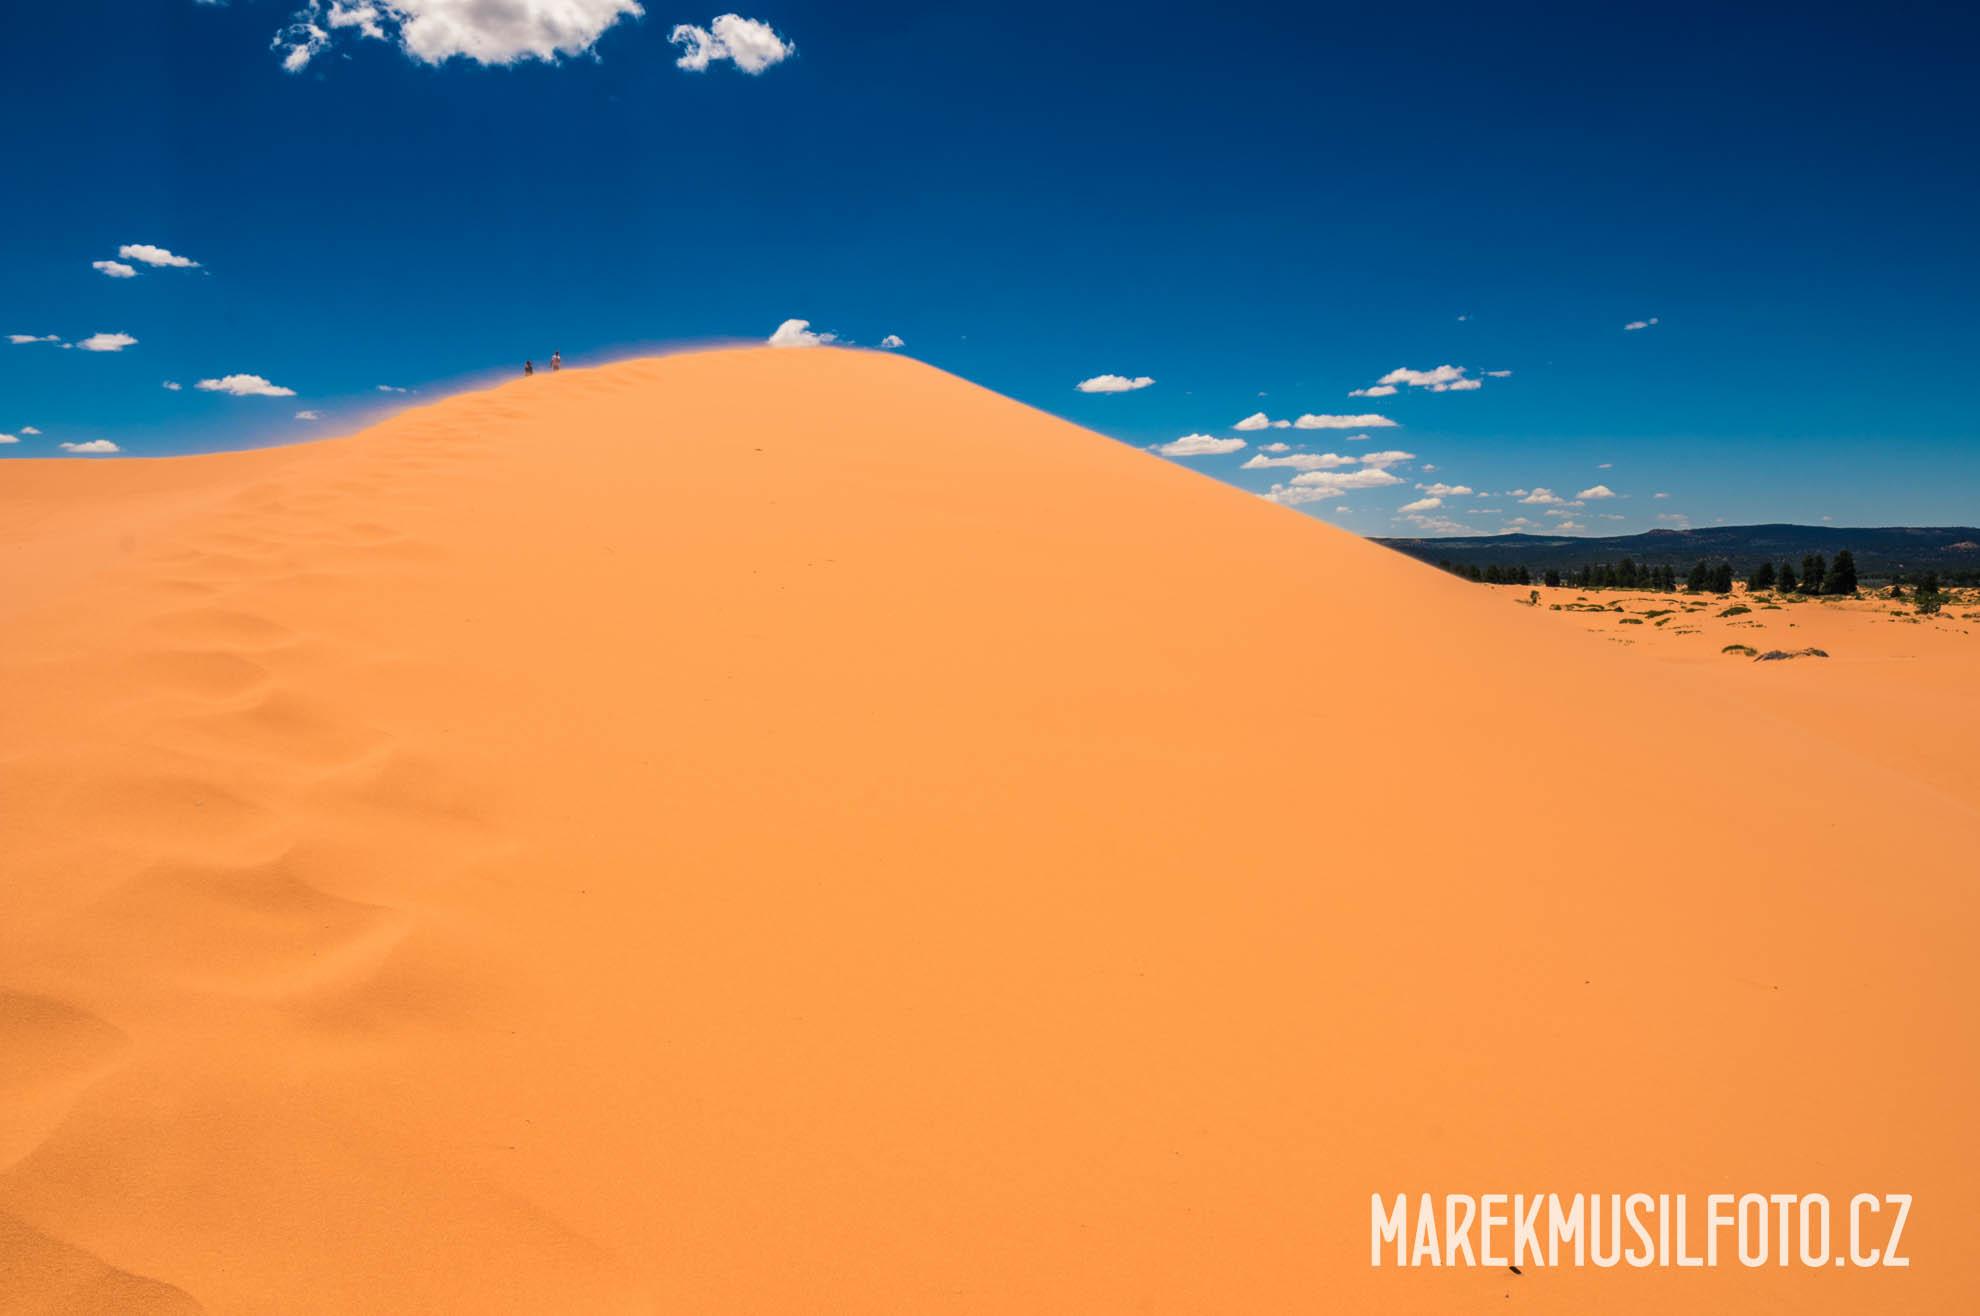 Cesta po USA - Coral Pink Dunes